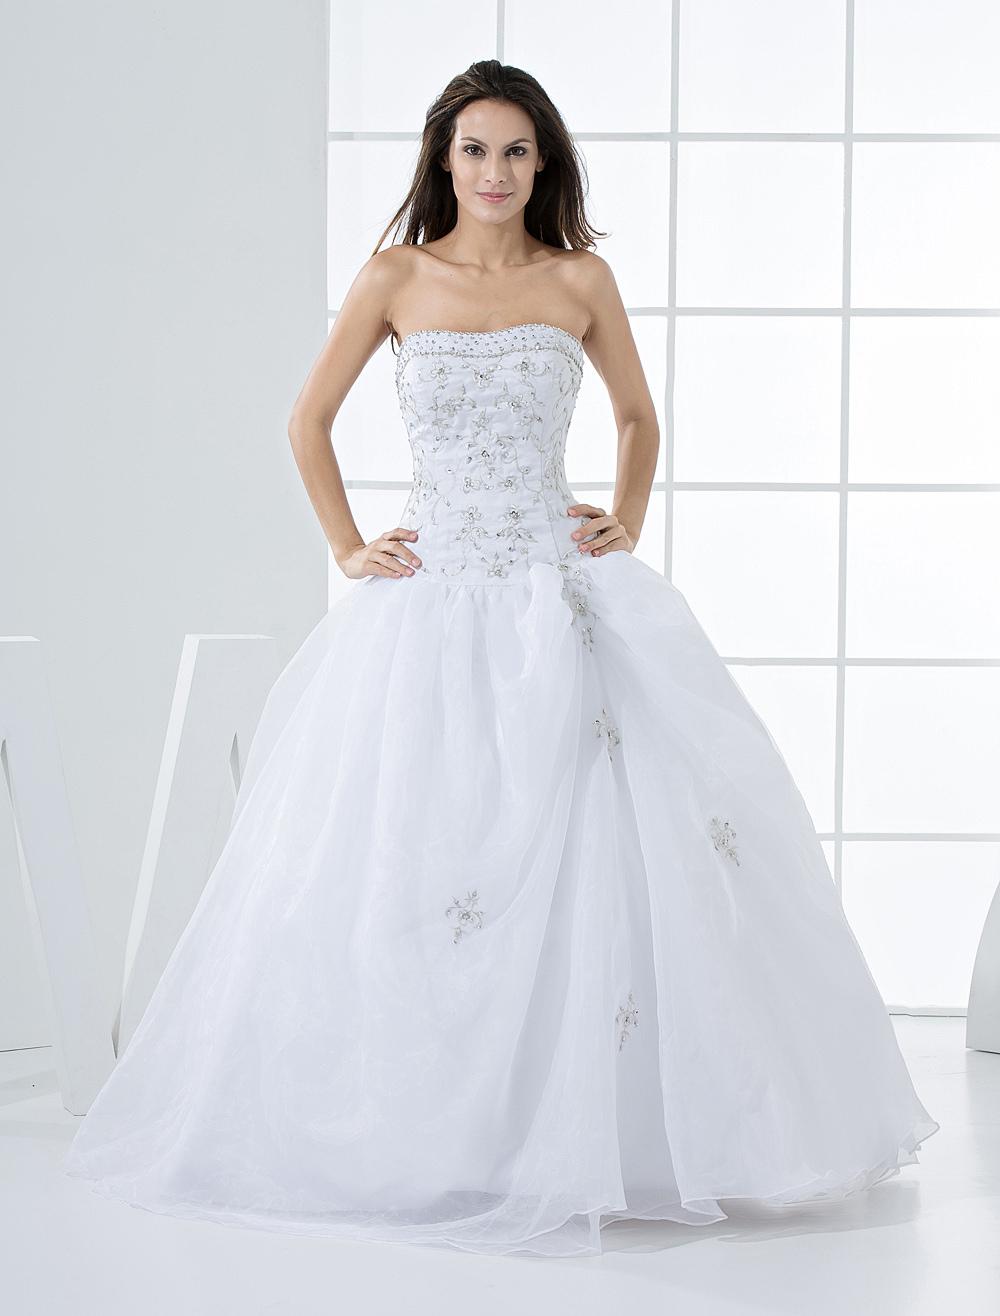 Elegant Ball Gown White Quinceanera Dress (Wedding Quinceanera Dresses) photo